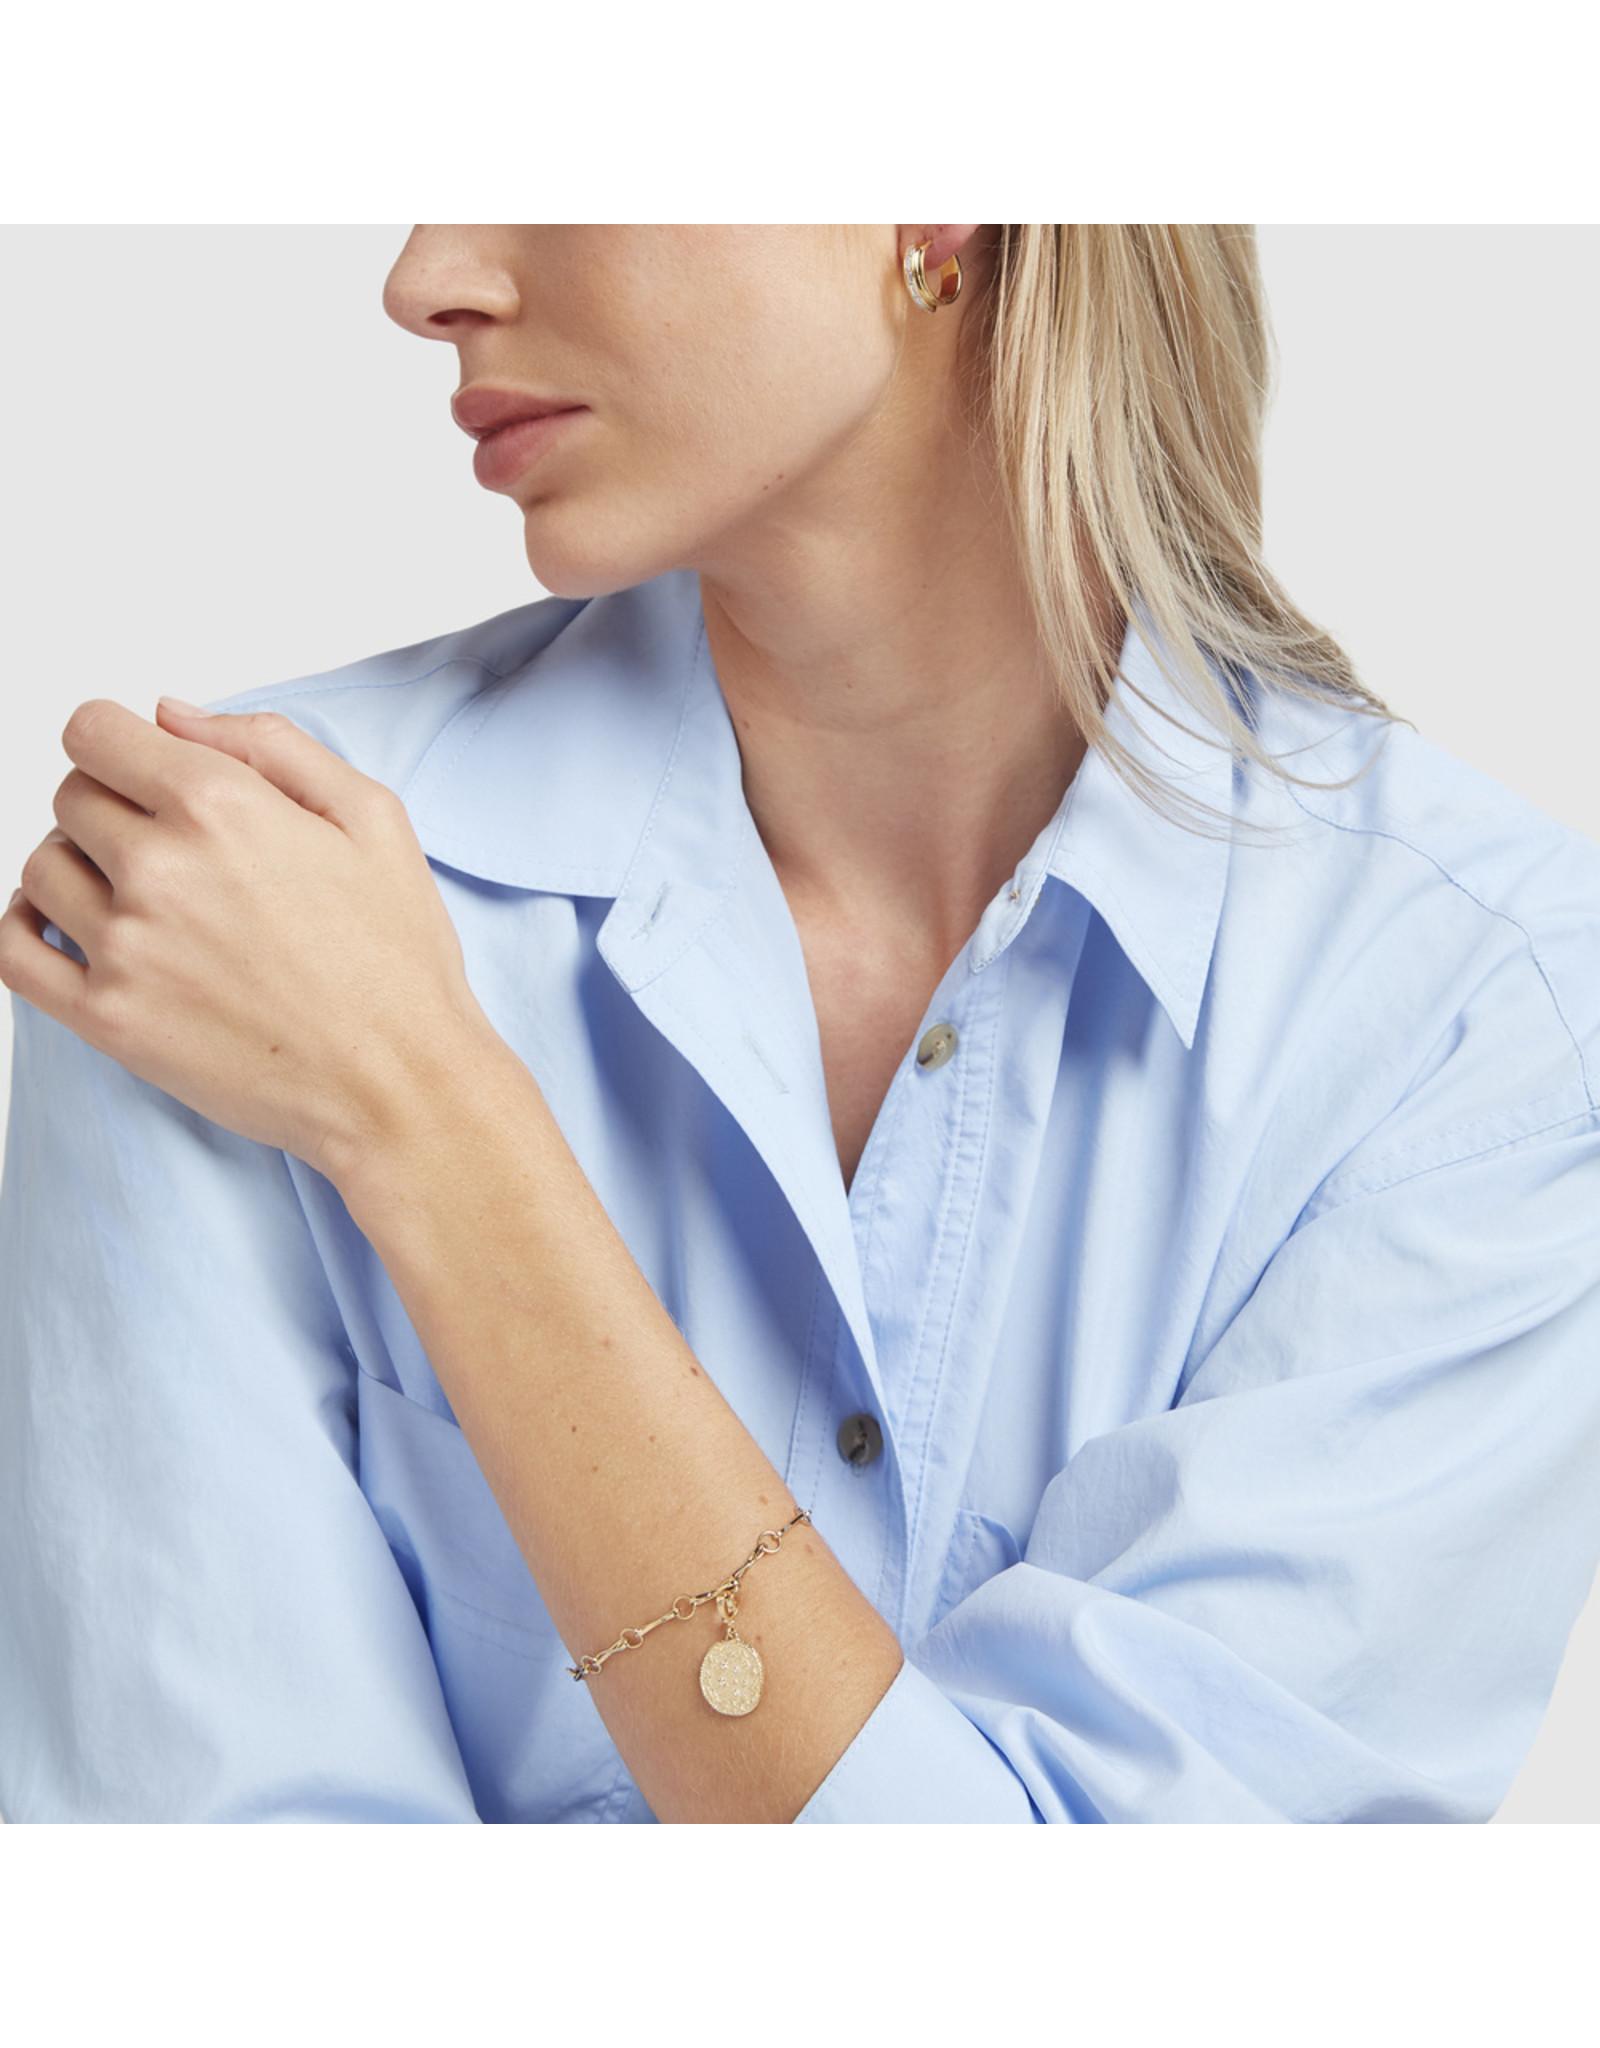 Azlee Azlee Handmade Link Bracelet with Zodia Wheel Coin -Yellow Gold / White Diamond